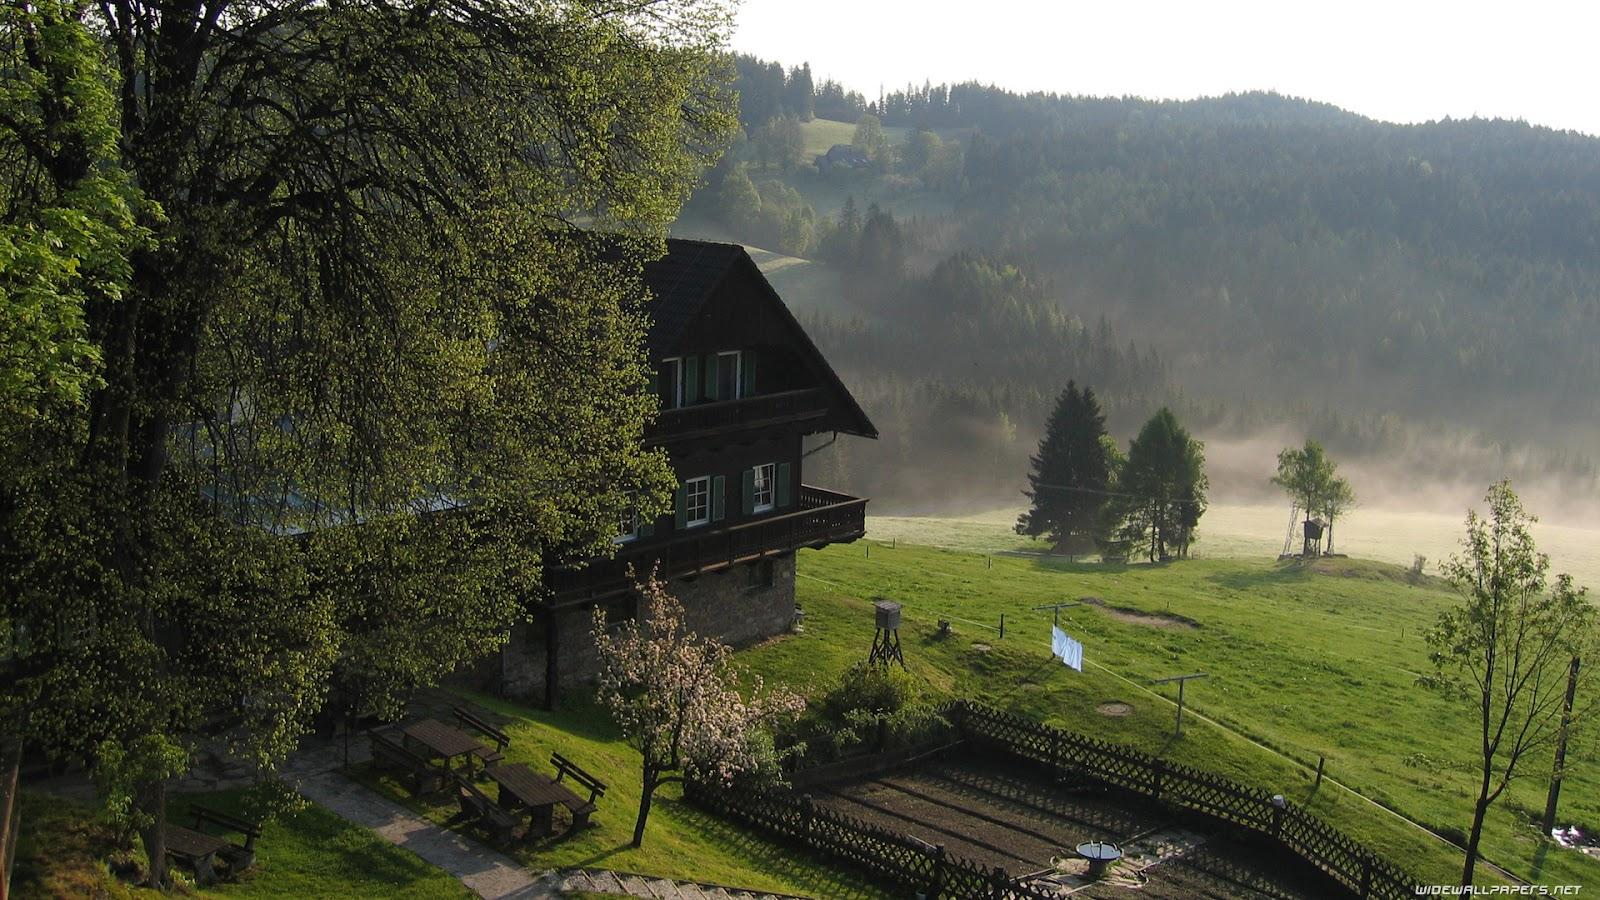 http://3.bp.blogspot.com/-hdyHP3QcfI4/T2GwefMTMWI/AAAAAAAACUs/-wJm0KDhgz0/s1600/Austria-1920x1080-005.jpg